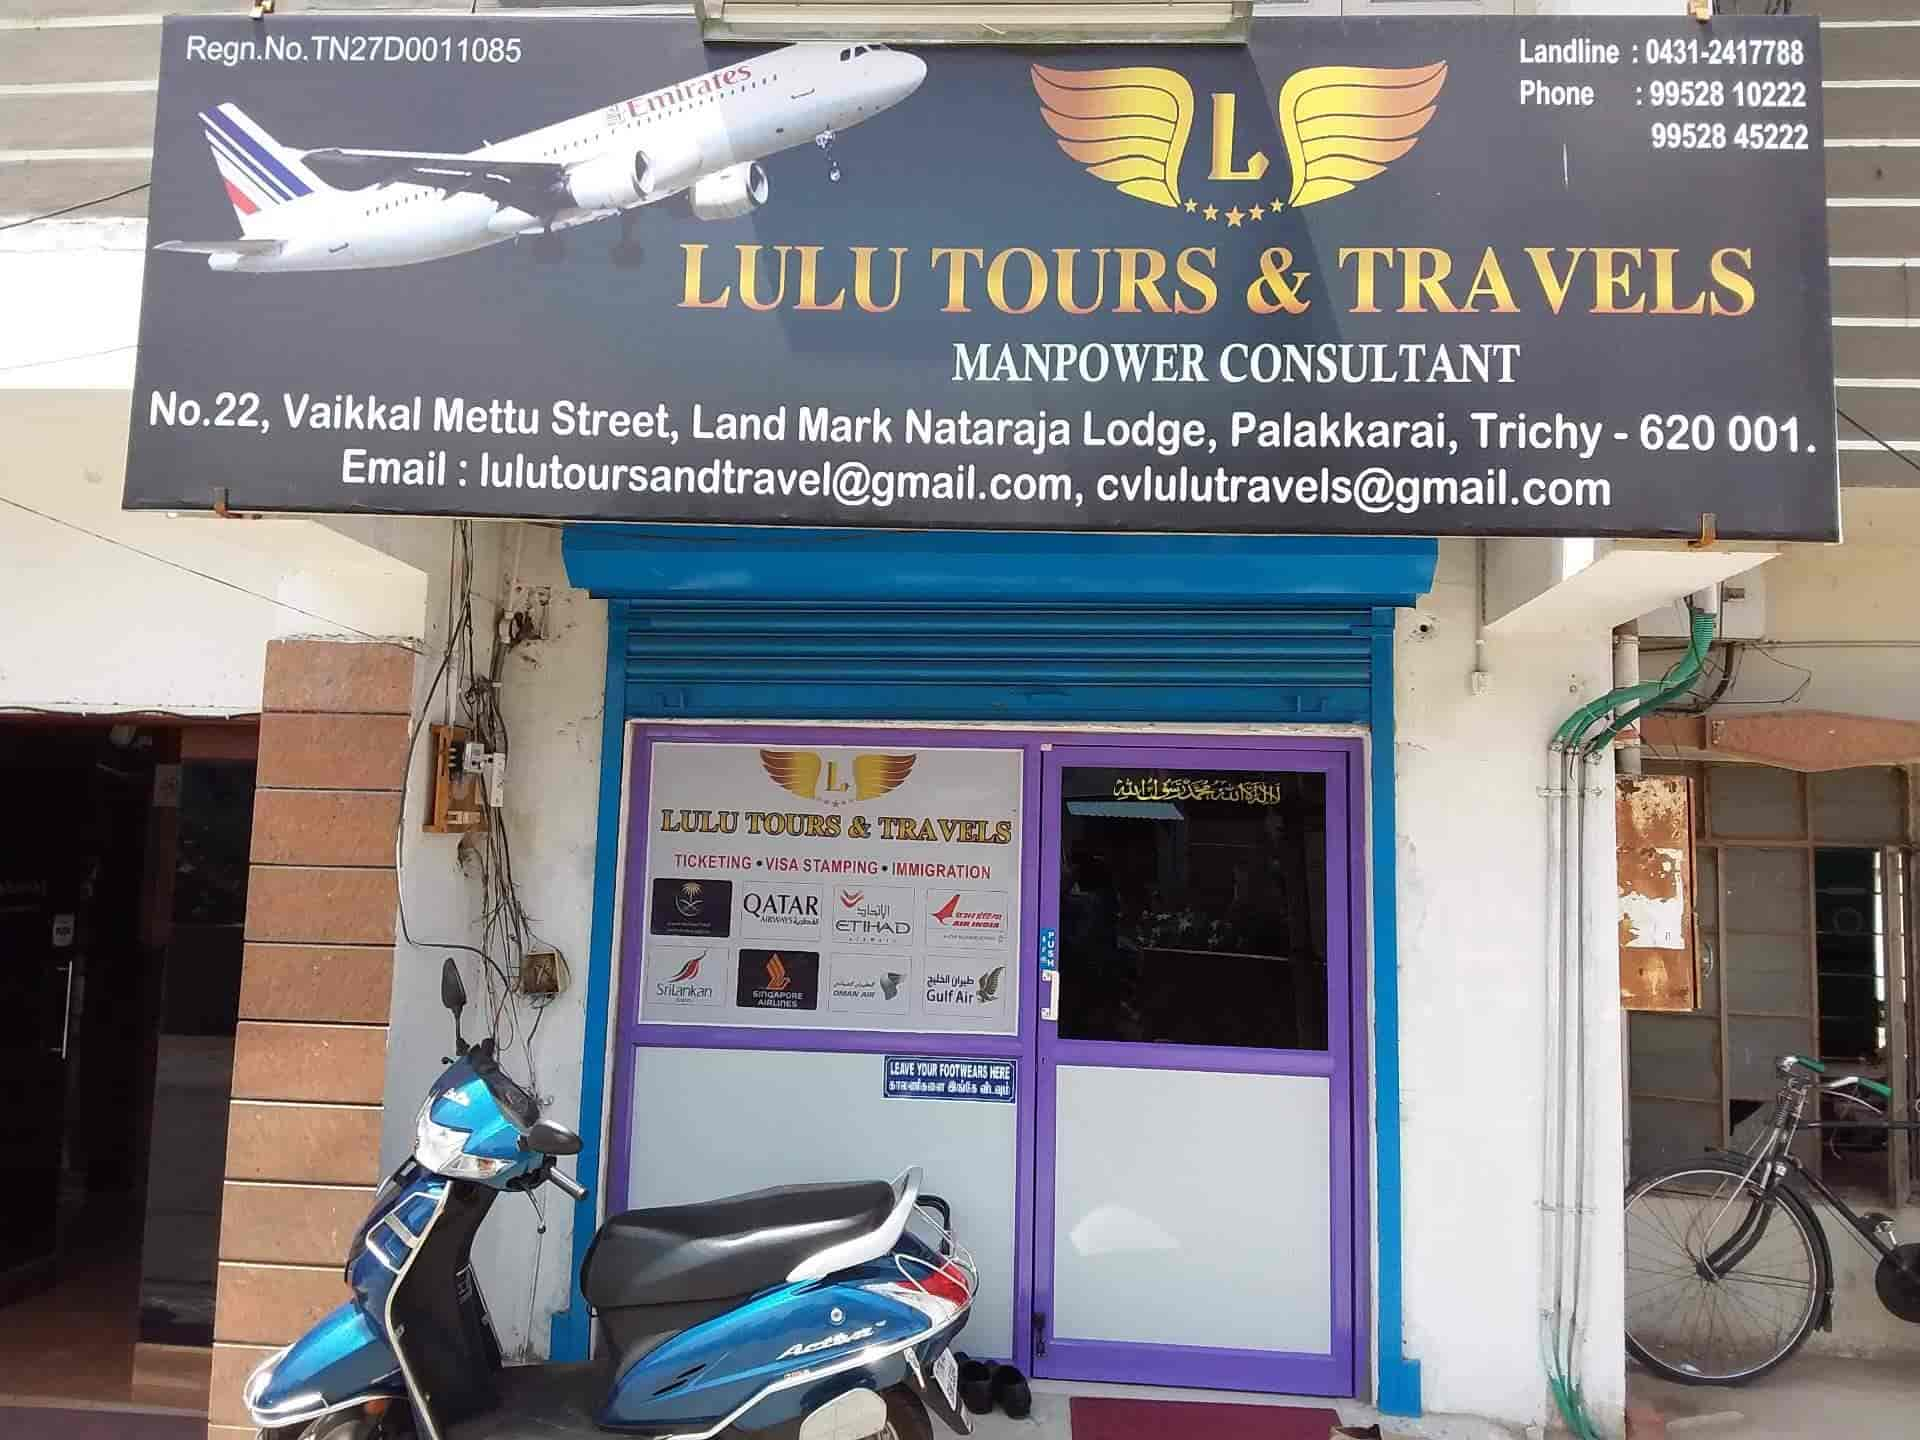 LULU TOURS & TRAVELS, Palakarai - Overseas Placement